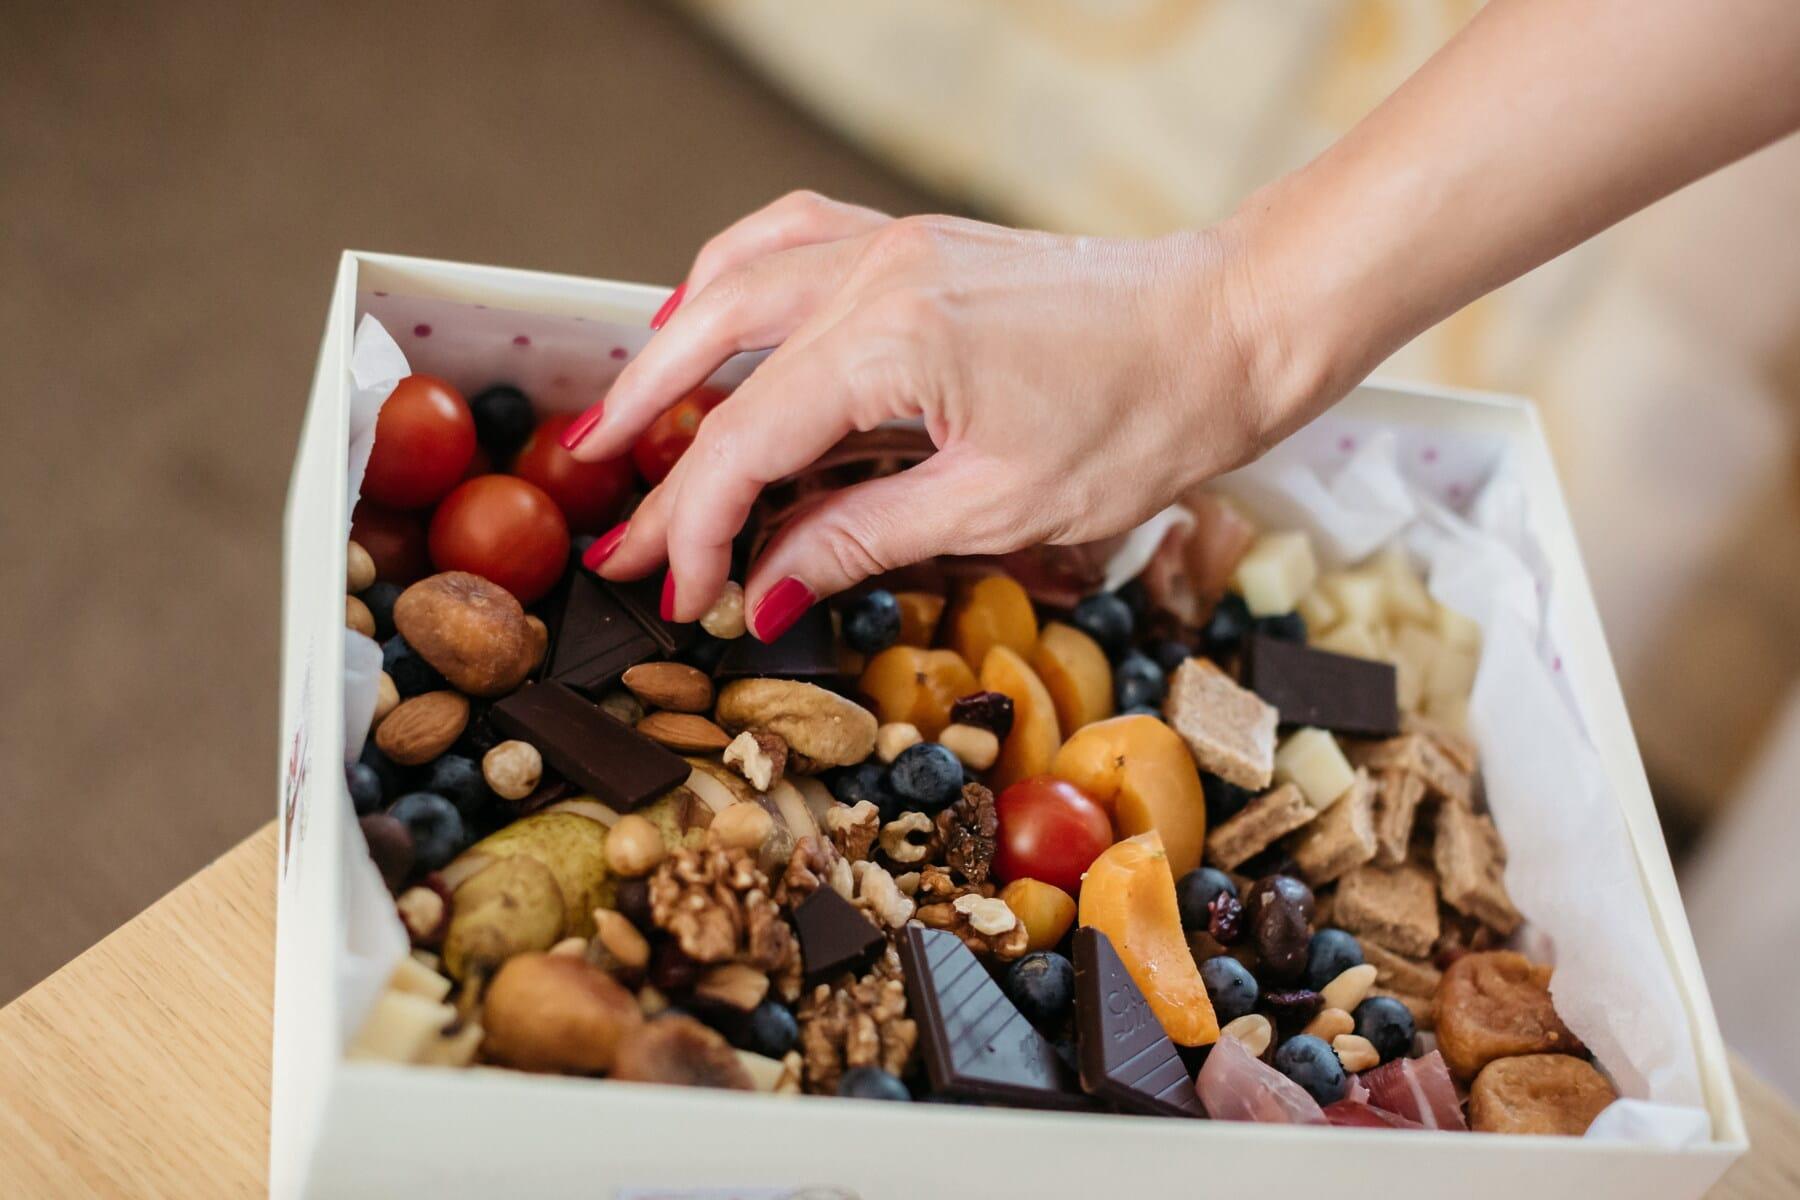 dessert, hand, woman, fruit, walnut, blackberry, dry, snack, chocolate, food